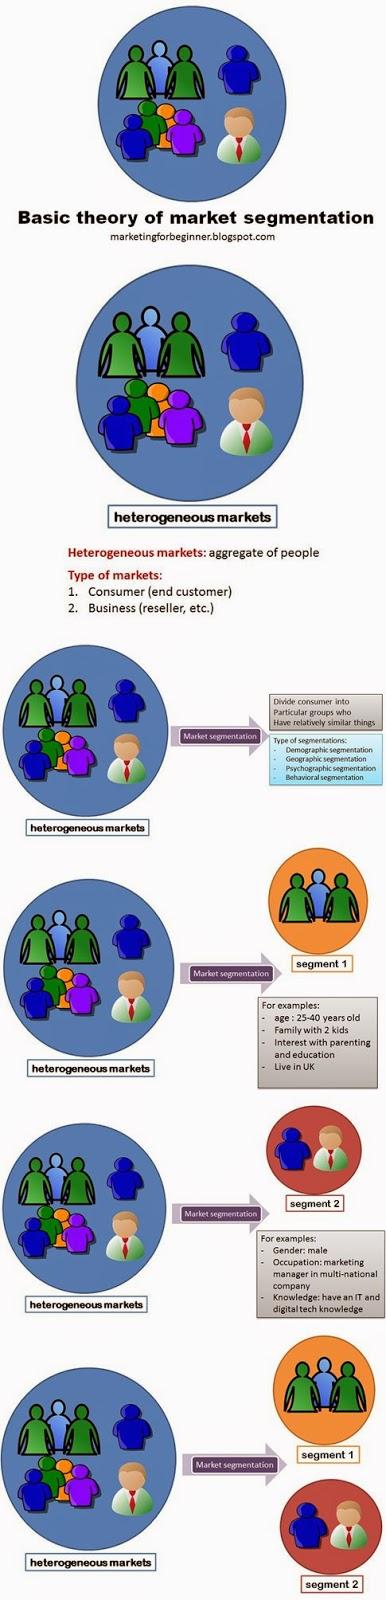 relationship between segmentation and targeting